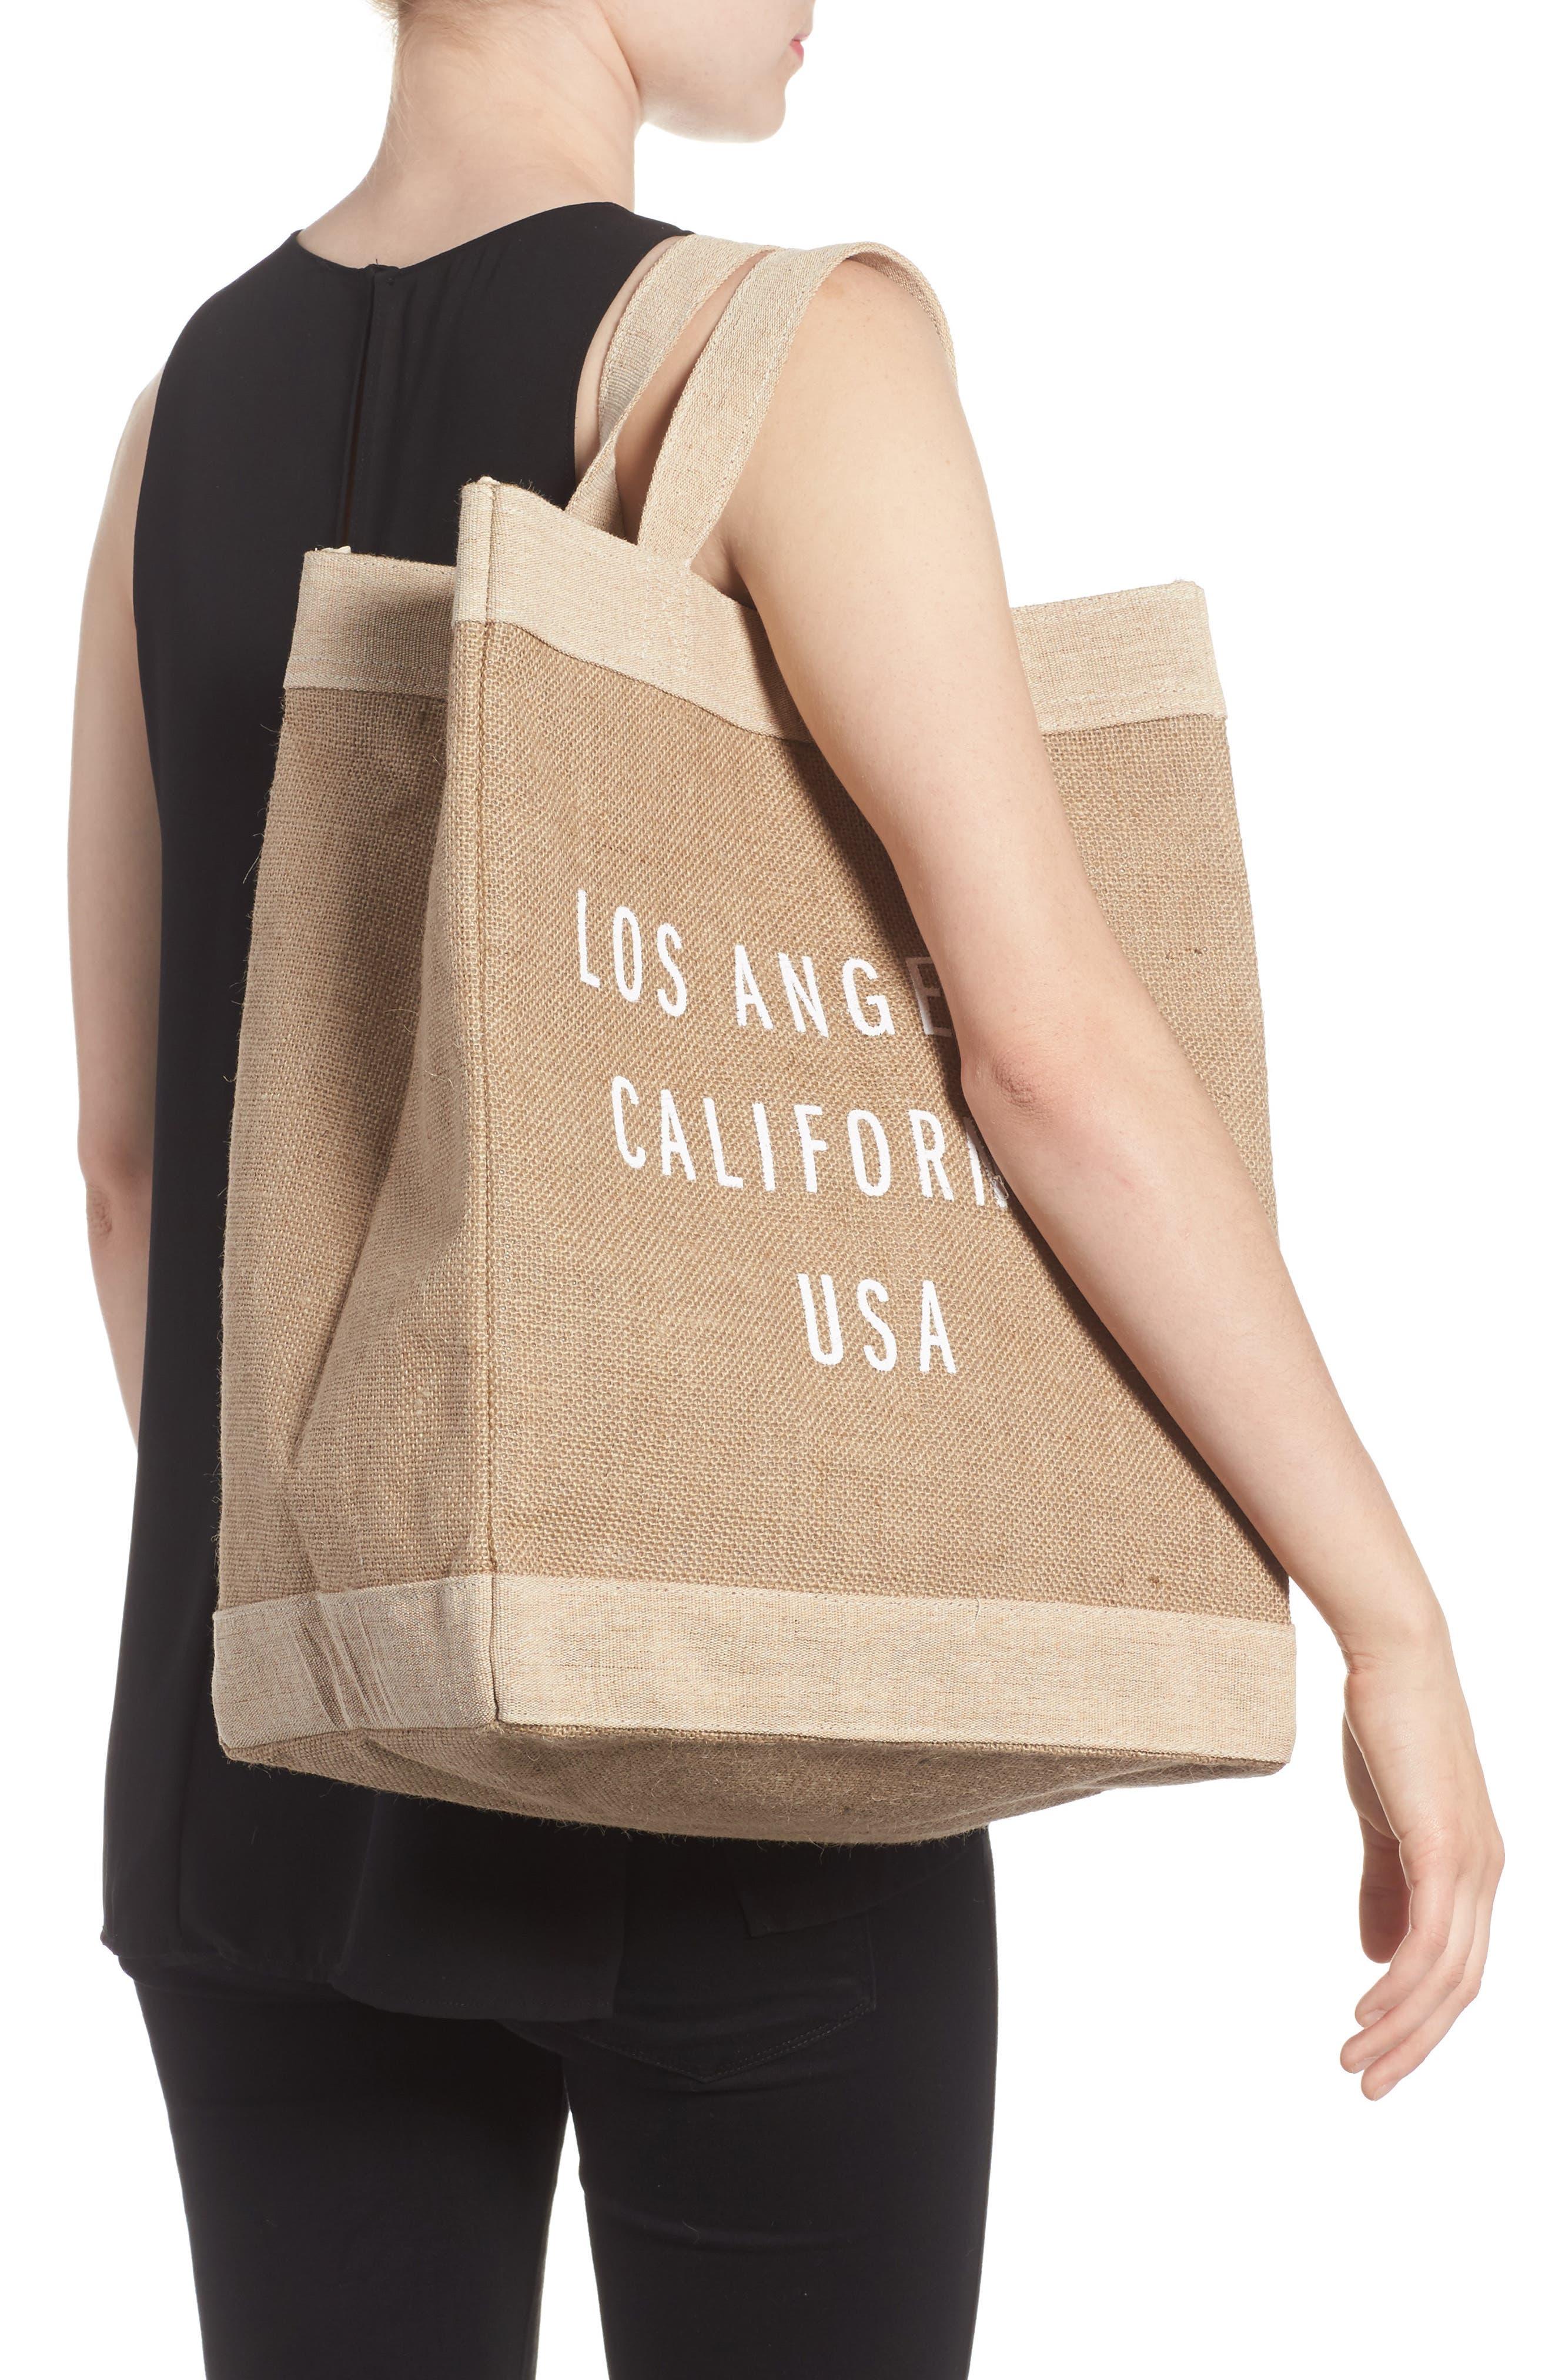 Los Angeles Simple Market Bag,                             Alternate thumbnail 2, color,                             200